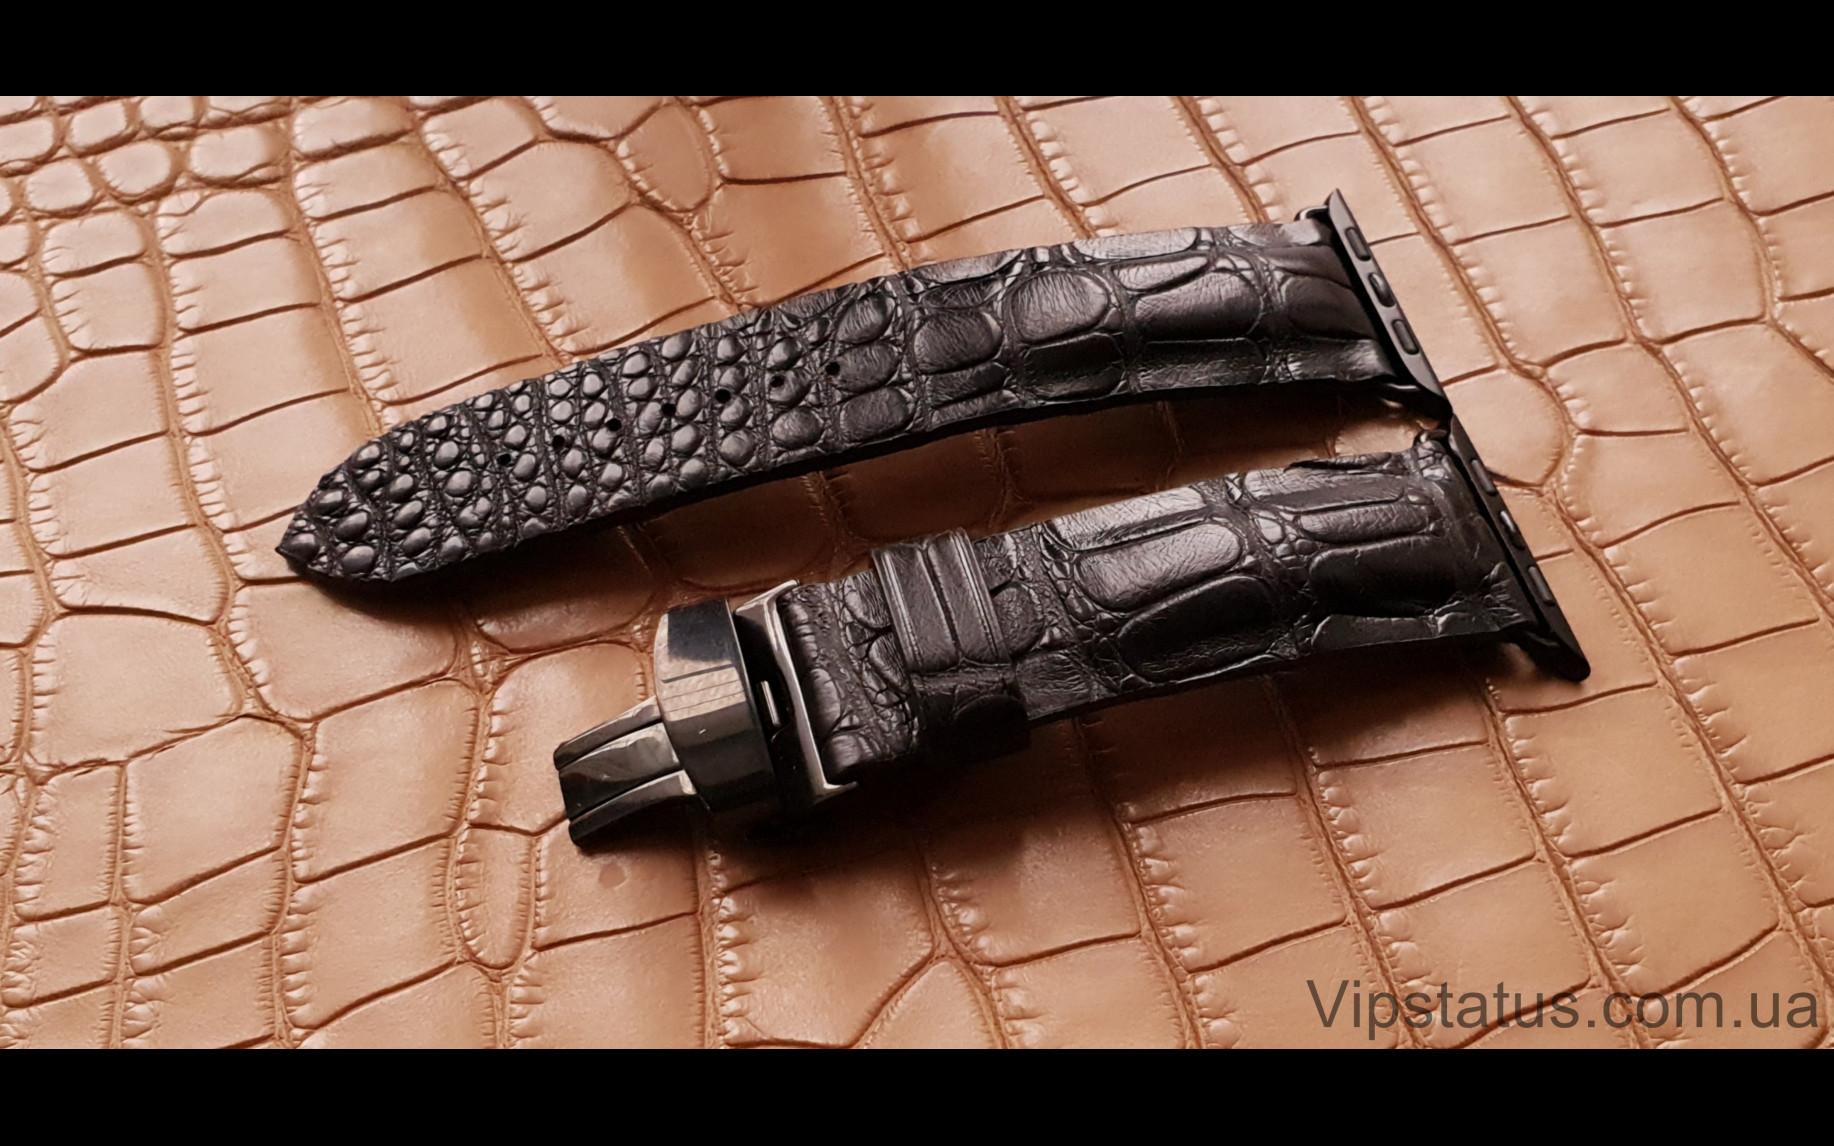 Elite Брутальный ремешок для часов Apple кожа крокодила Brutal Crocodile Strap for Apple watches image 1